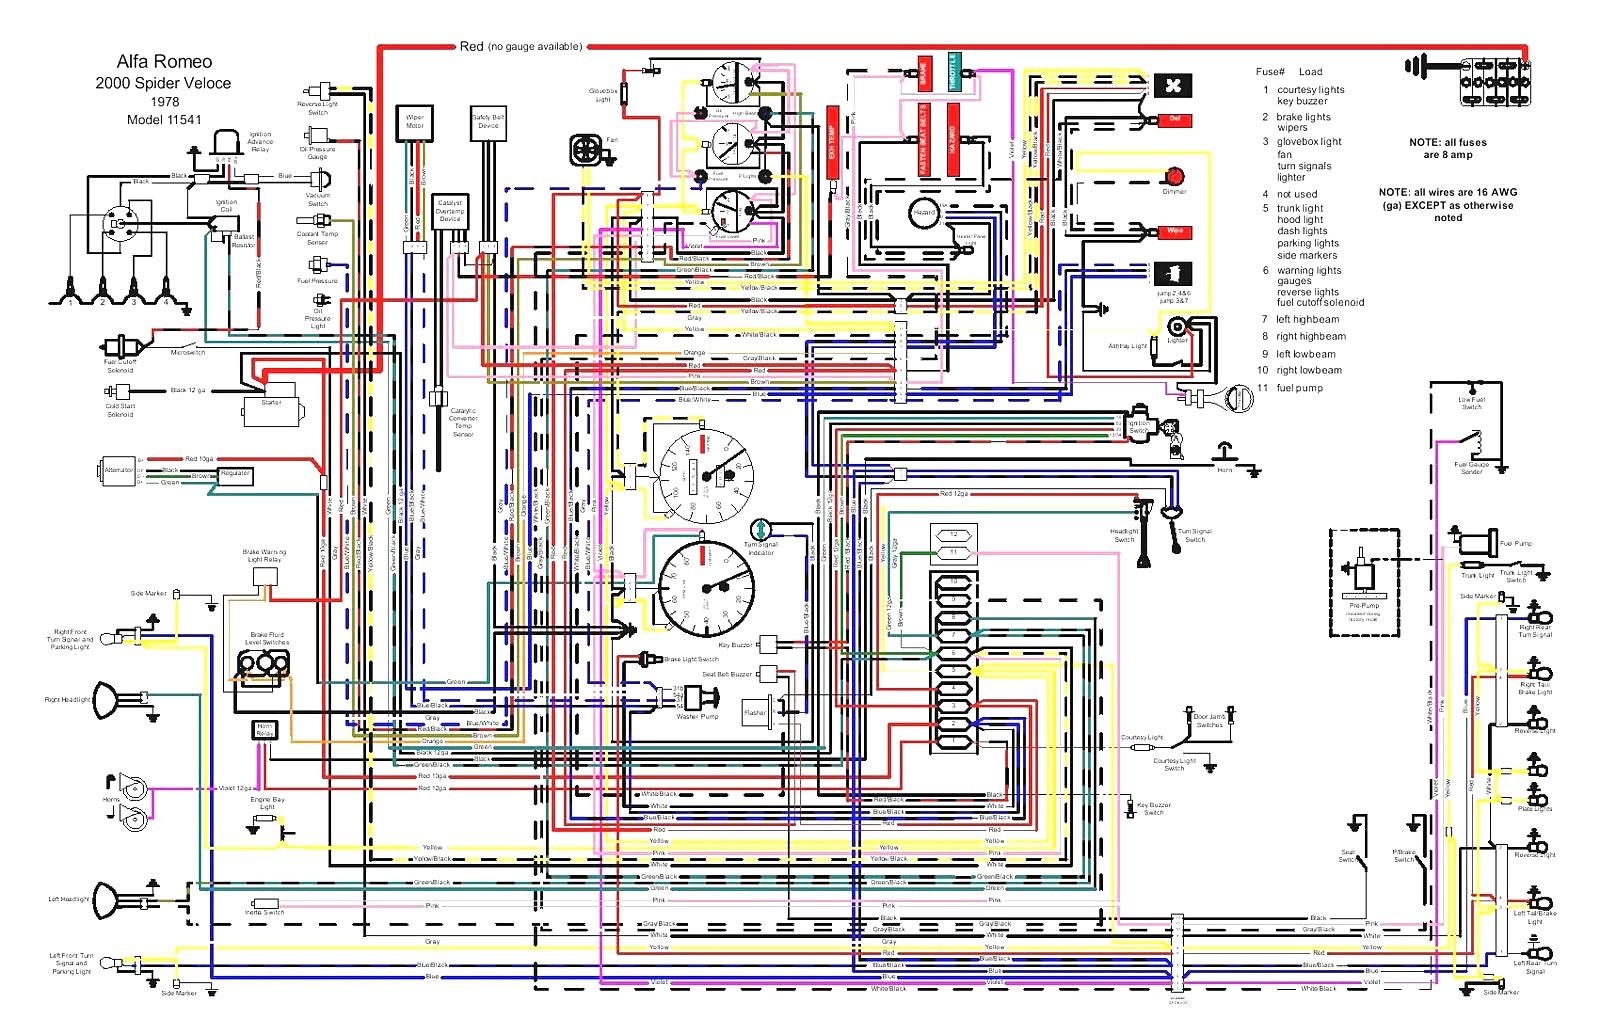 Car Wiring Diagram Program | Wiring Diagram - Wiring Diagram Maker